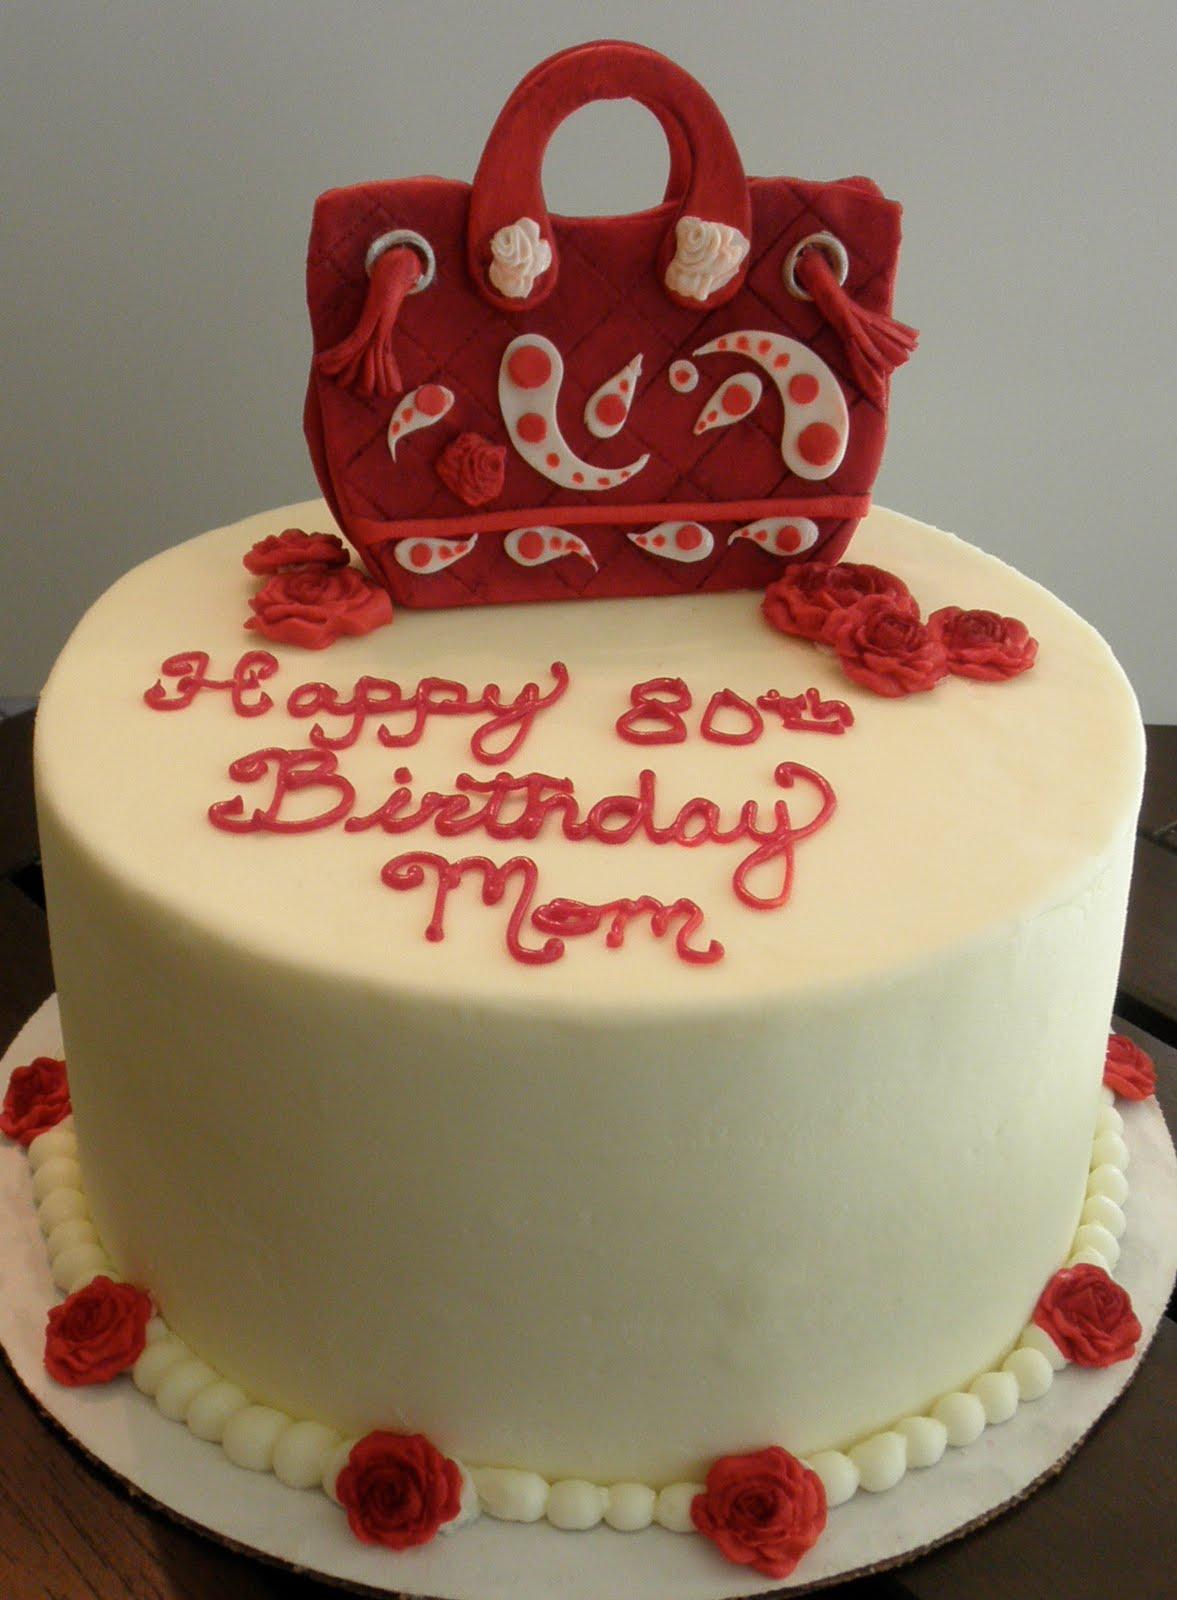 Rose Happy Birthday Mom Gifts On Zazzle Sweet Ts Cake Design Adirondack Beach Chair And Seashell